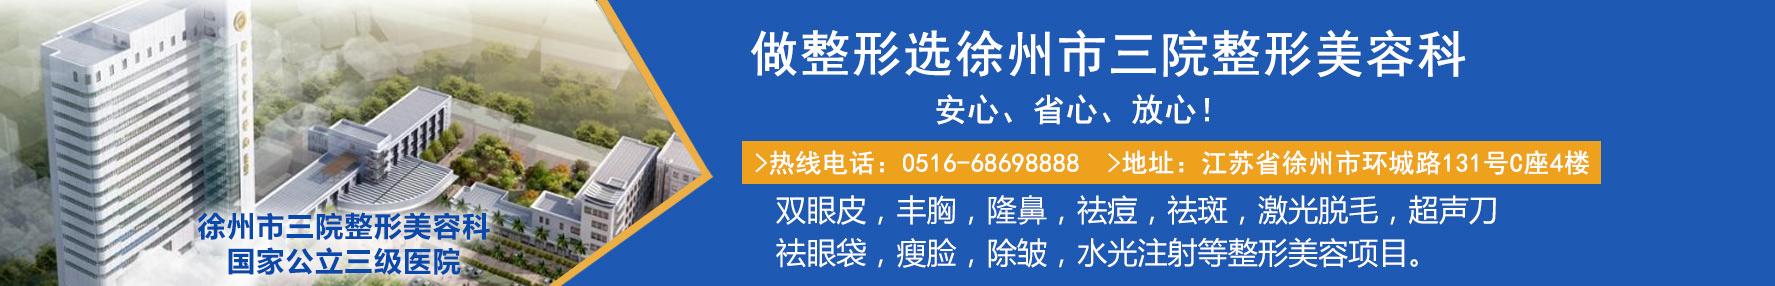 徐州市三院整形美容中心banner